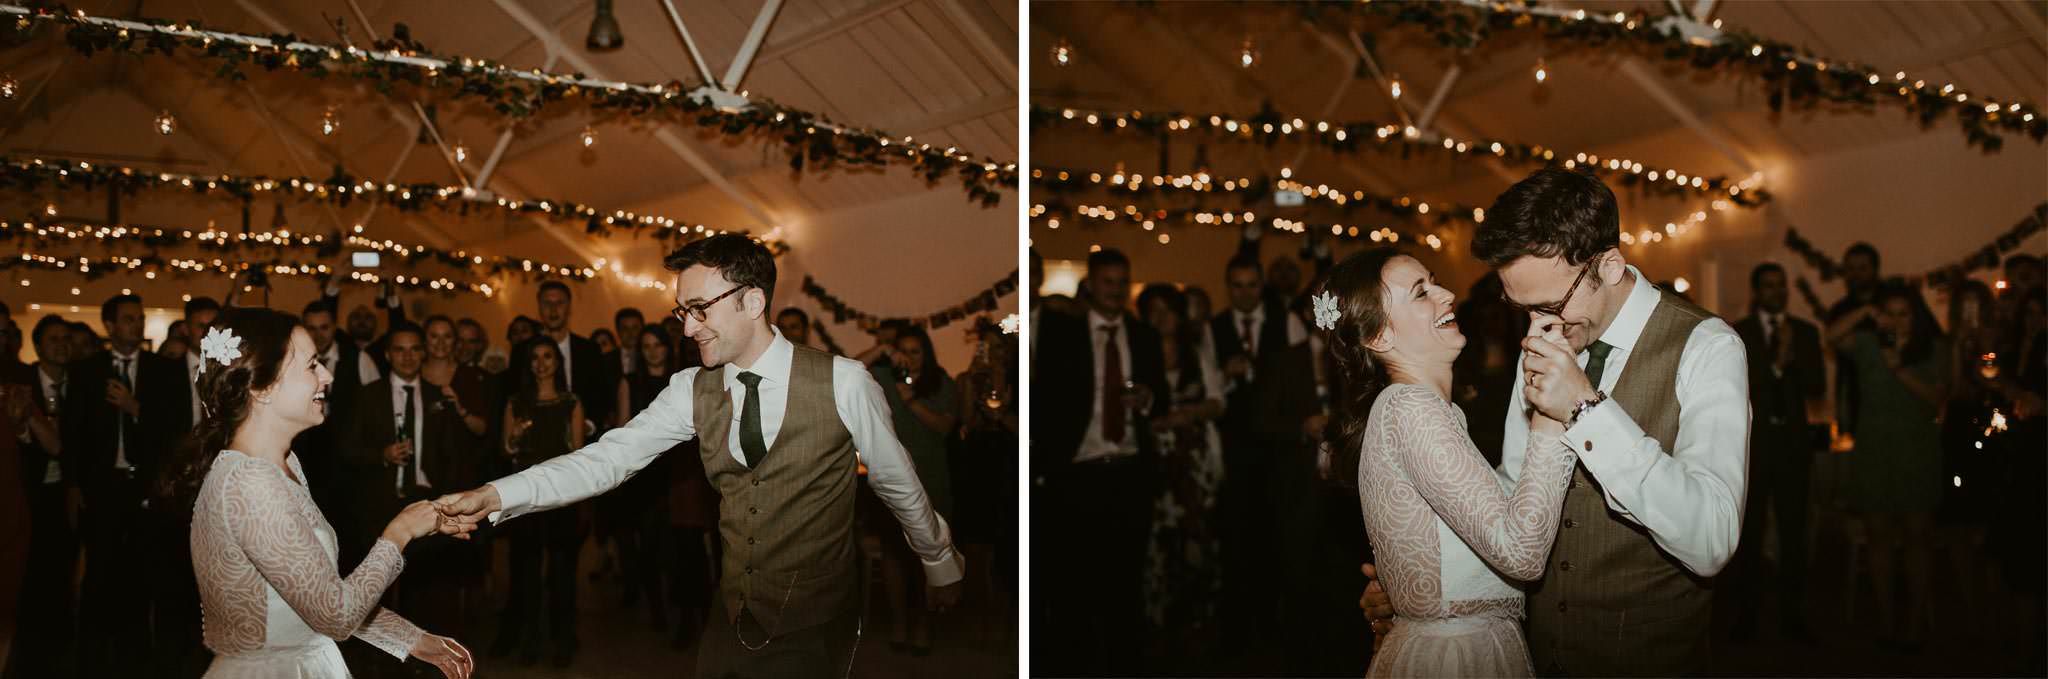 crear-wedding-photographer-130